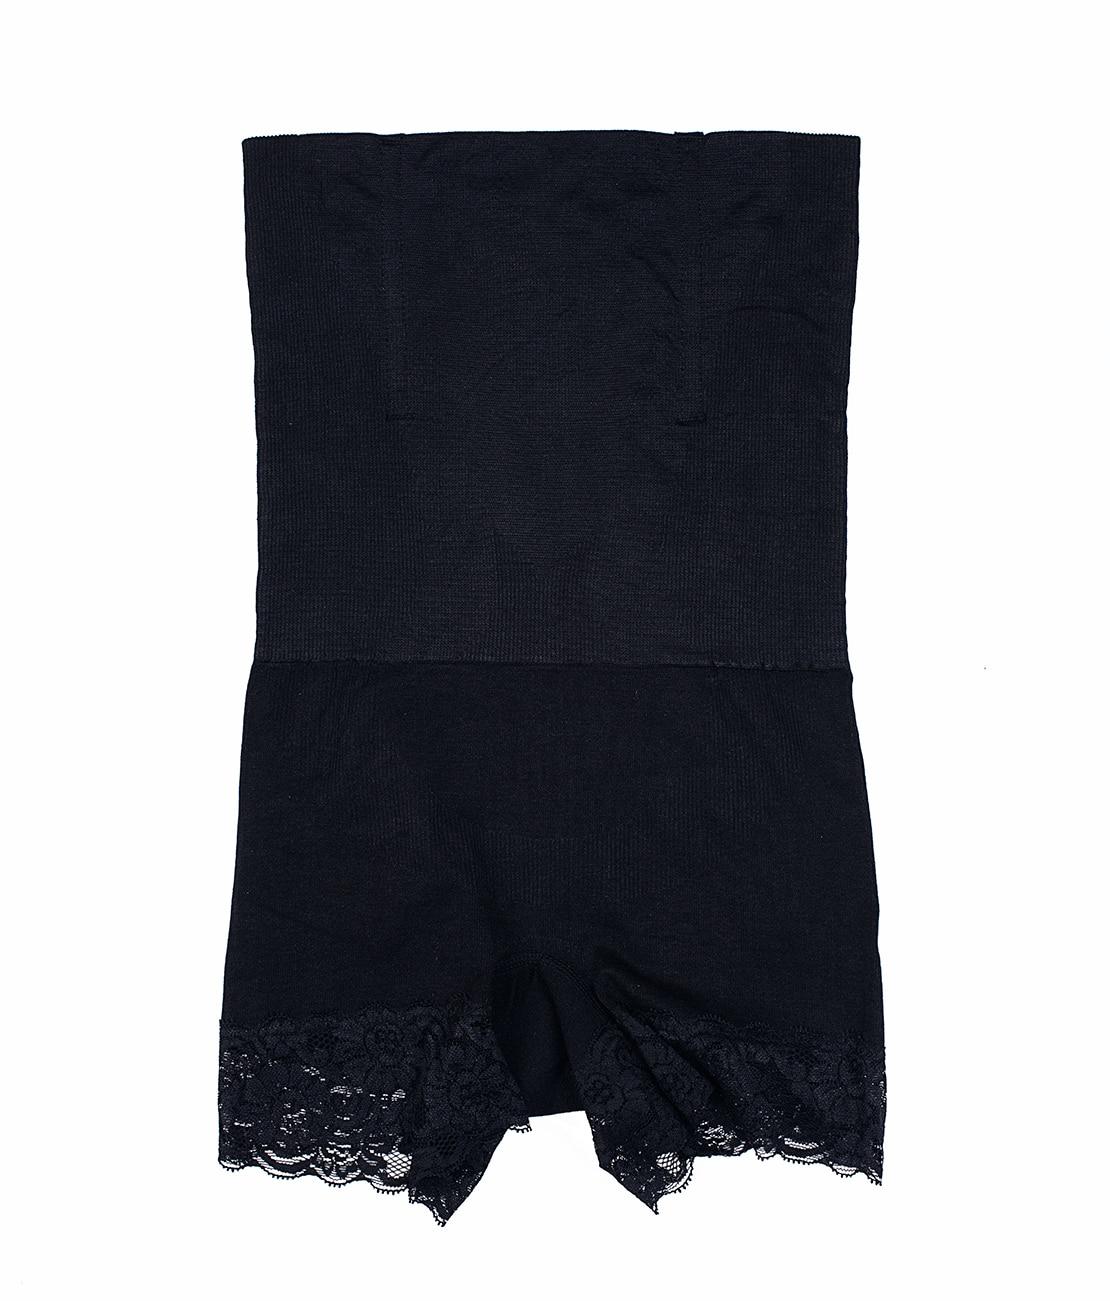 Panty Taille Haute Noir Packshot Front